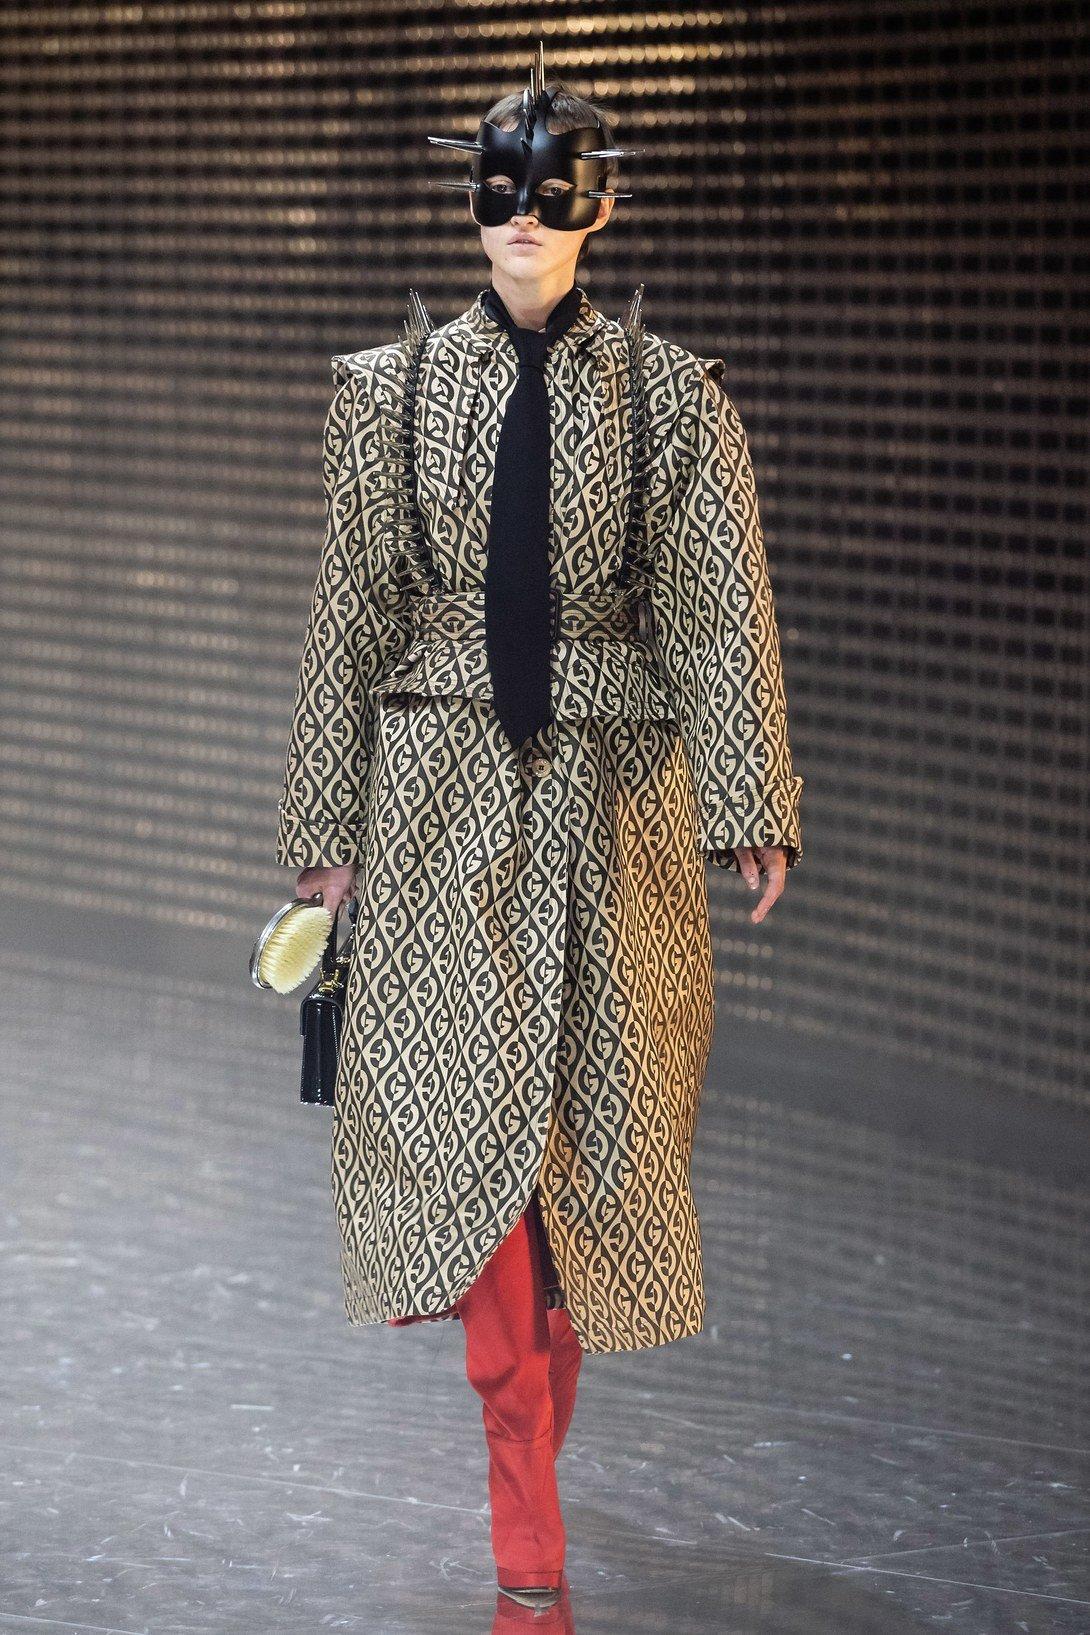 a18791c3d3 Come è andata la Fashion Week di Milano | Artribune